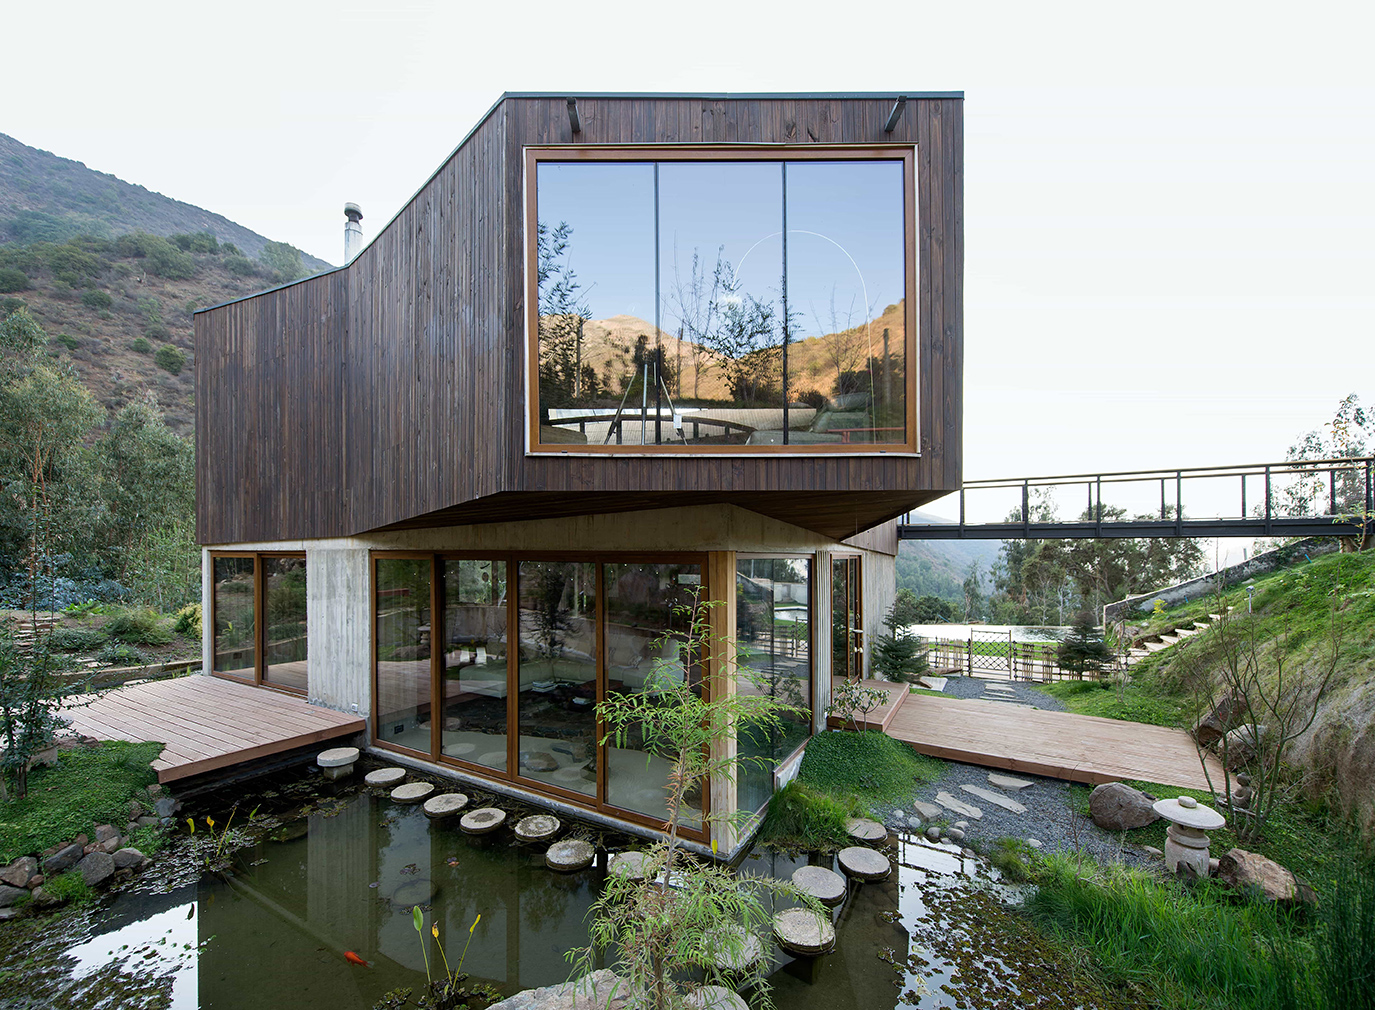 Casa El Maqui is a timber-clad mountain retreat near Santiago